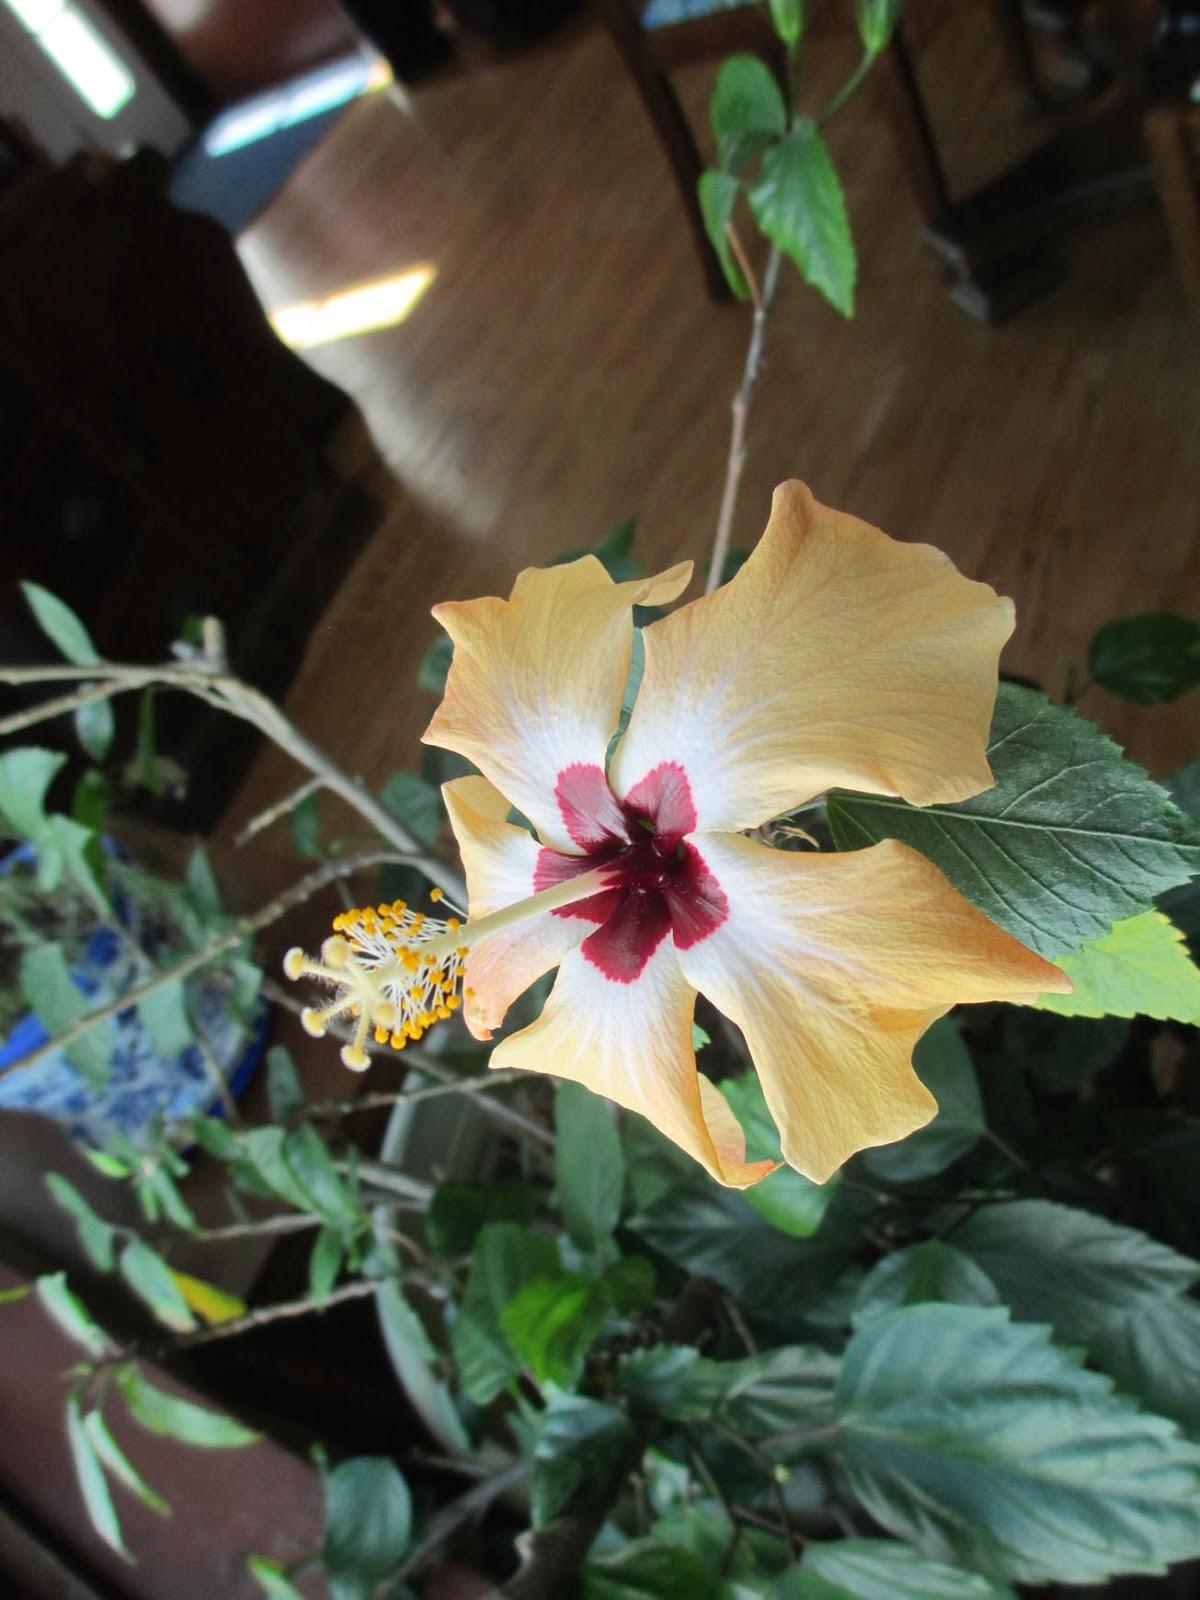 Garden Fancy: Fertilizer Friday: February 21